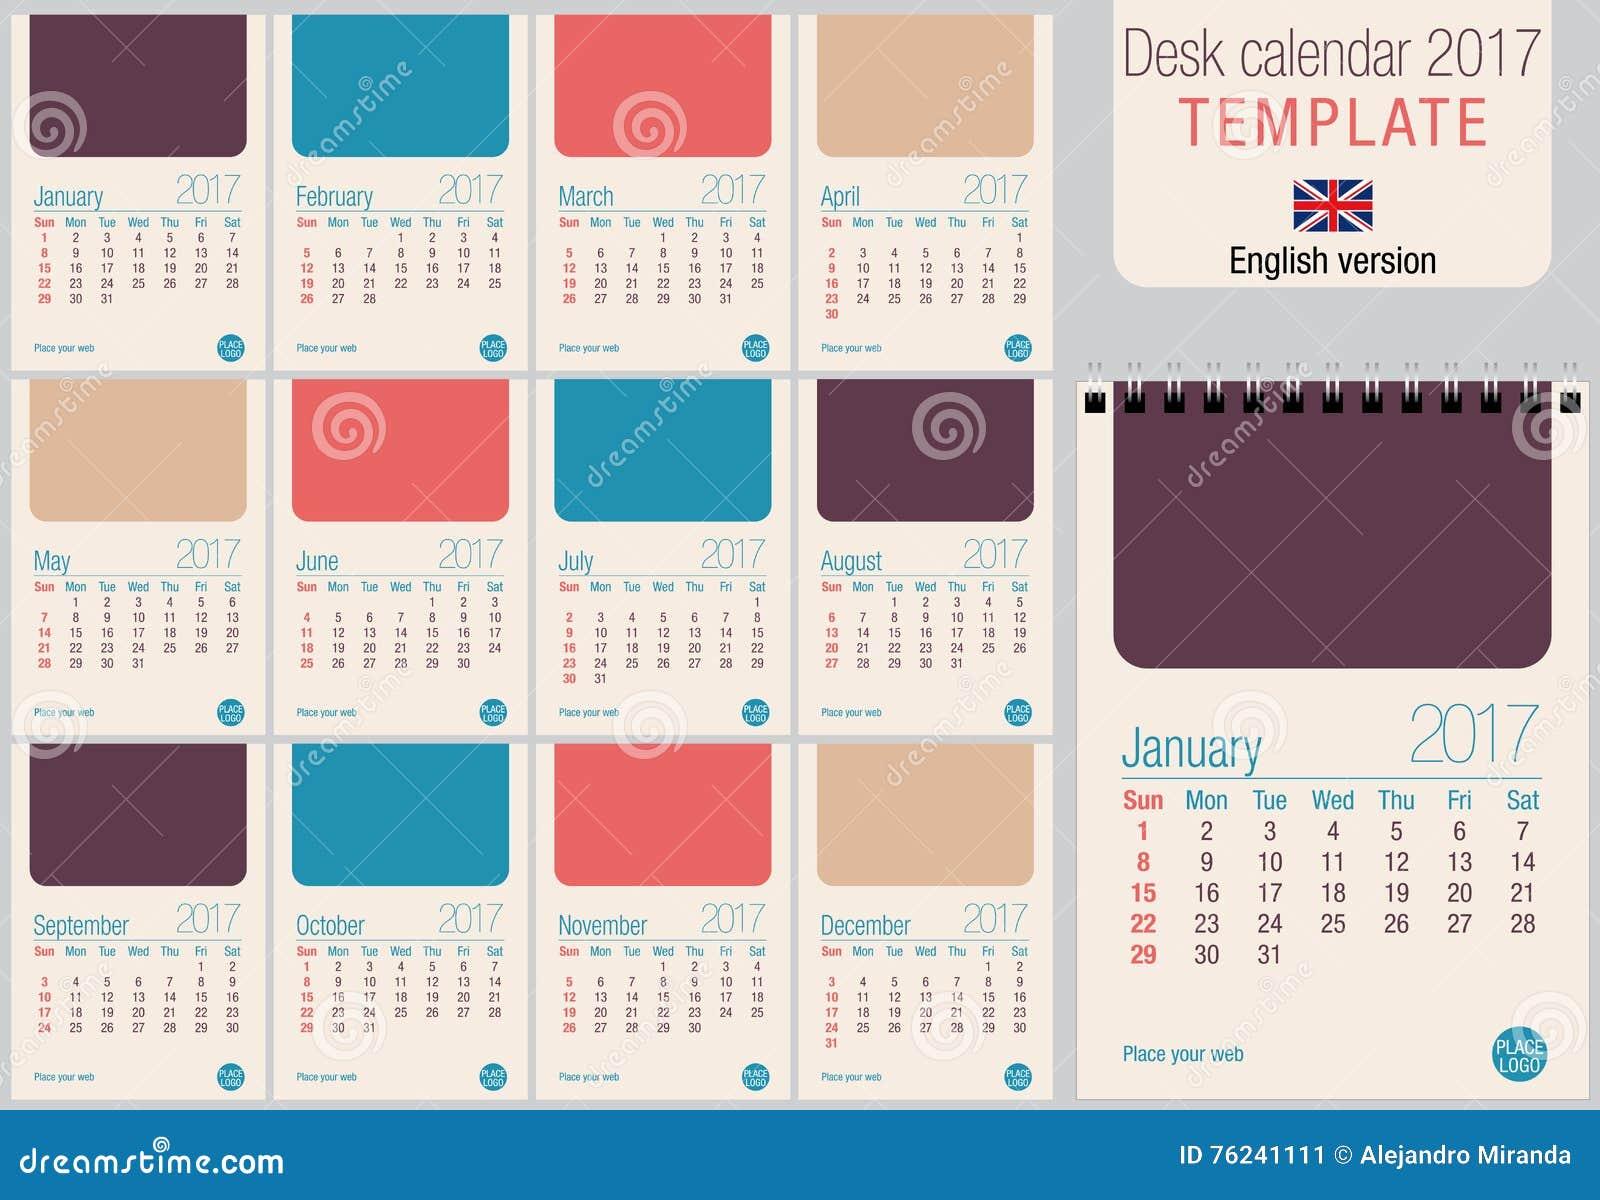 Table Calendar Size : Desk calendar template in pastel colors ready for